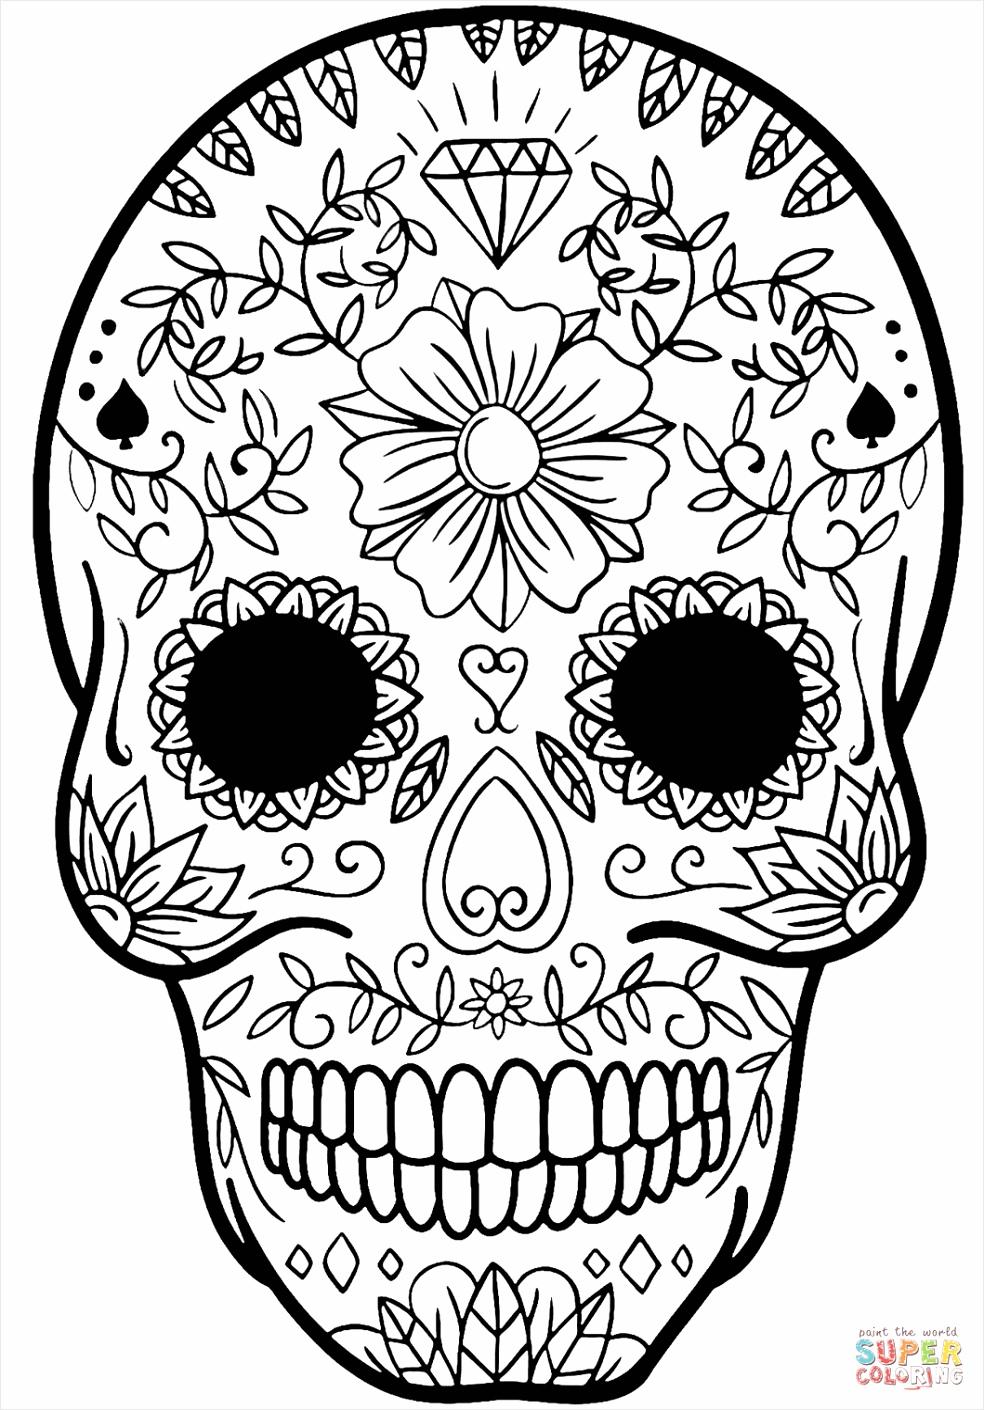 sugar skull coloringge free printableges image inspirations urmoi